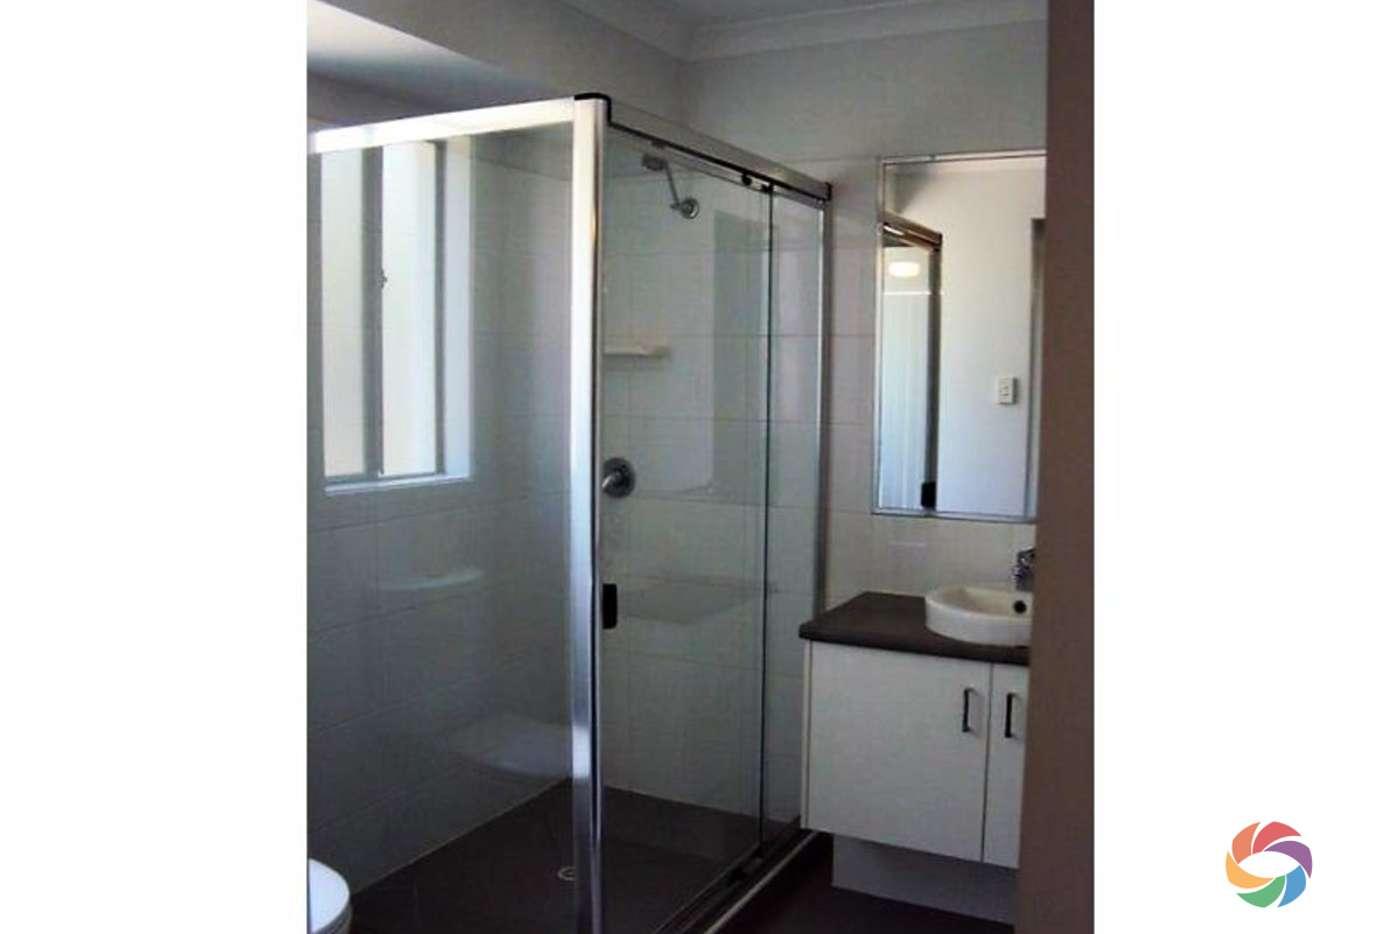 Seventh view of Homely house listing, 10 Banyandah Close, Birtinya QLD 4575